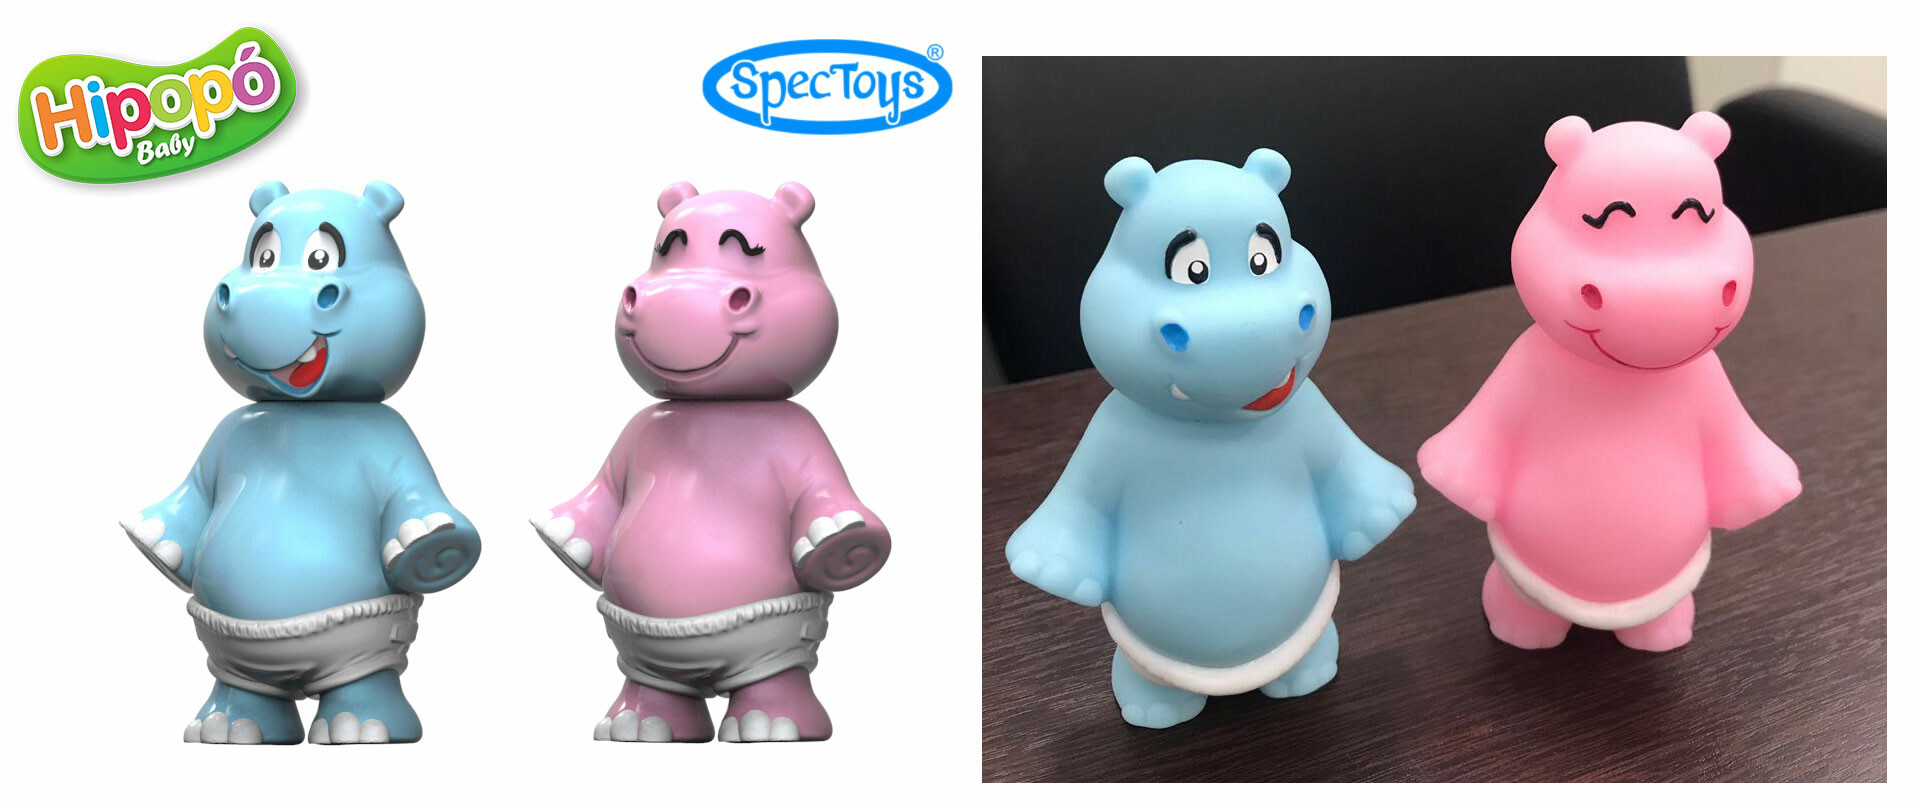 Alex pereira hippos